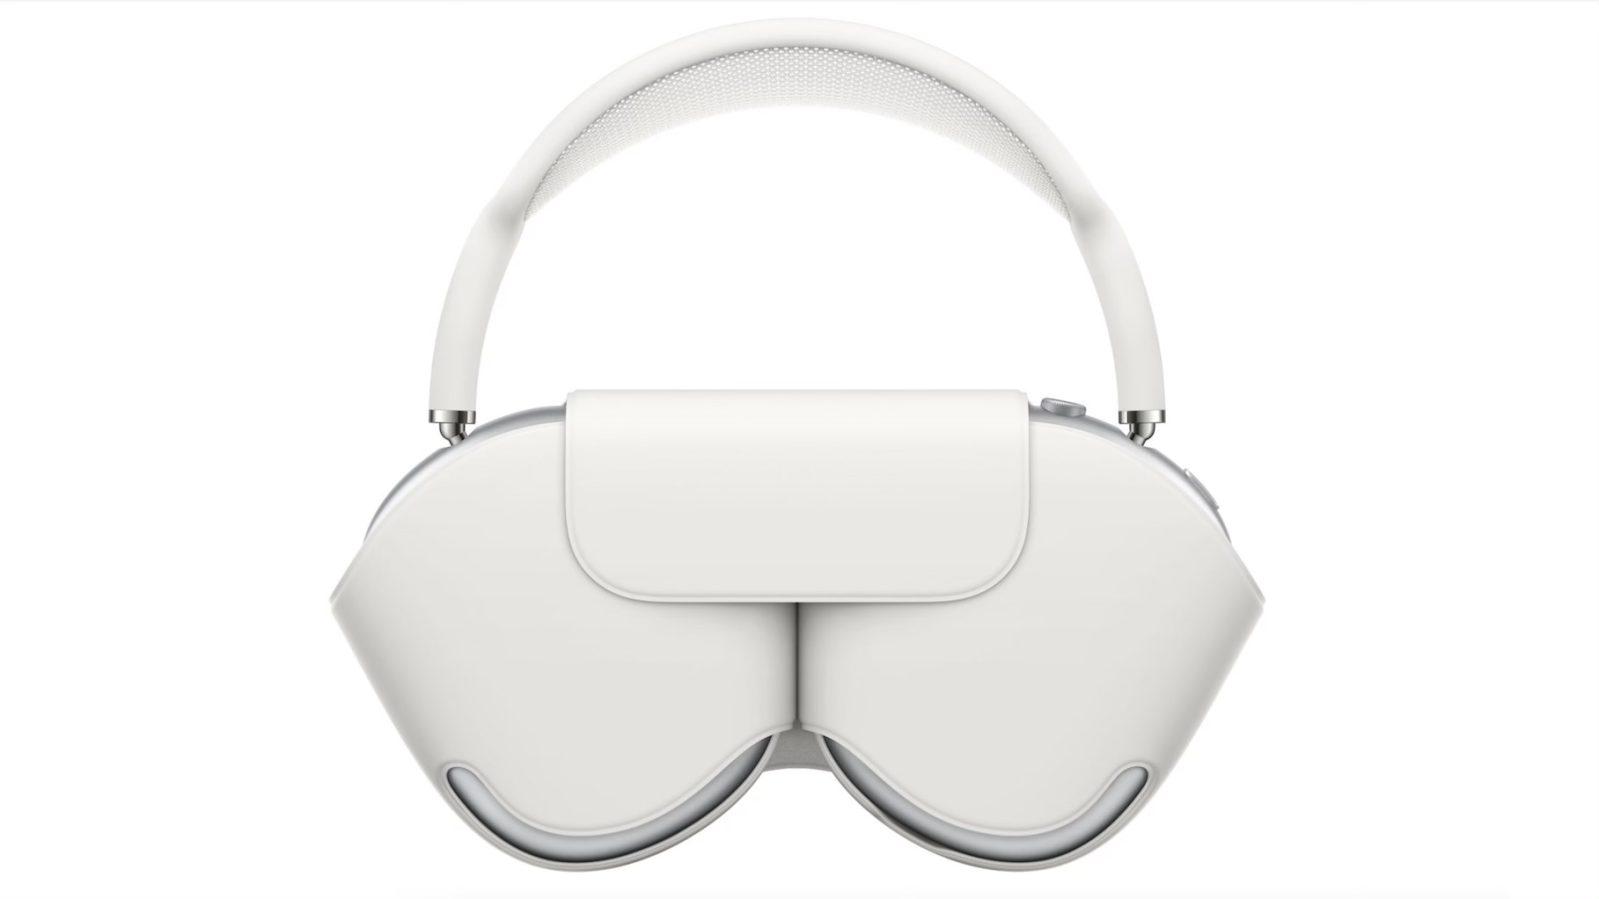 AirPods Max case: A bizarre but occasionally useful accessory